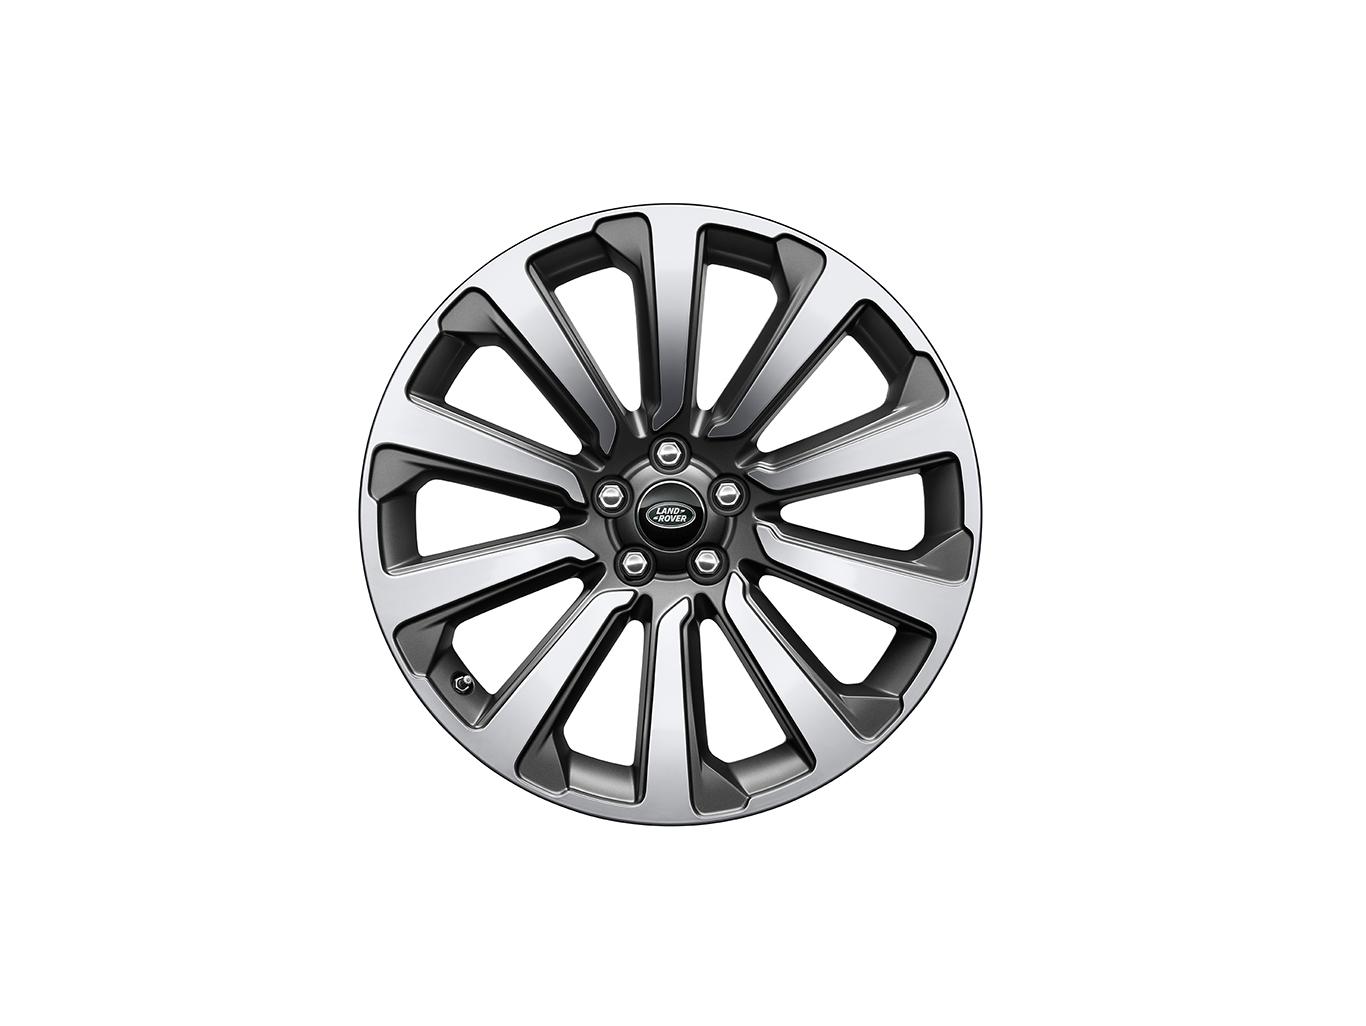 Колесный диск R21 Style 1033 Satin Dark Grey для Range Rover Velar